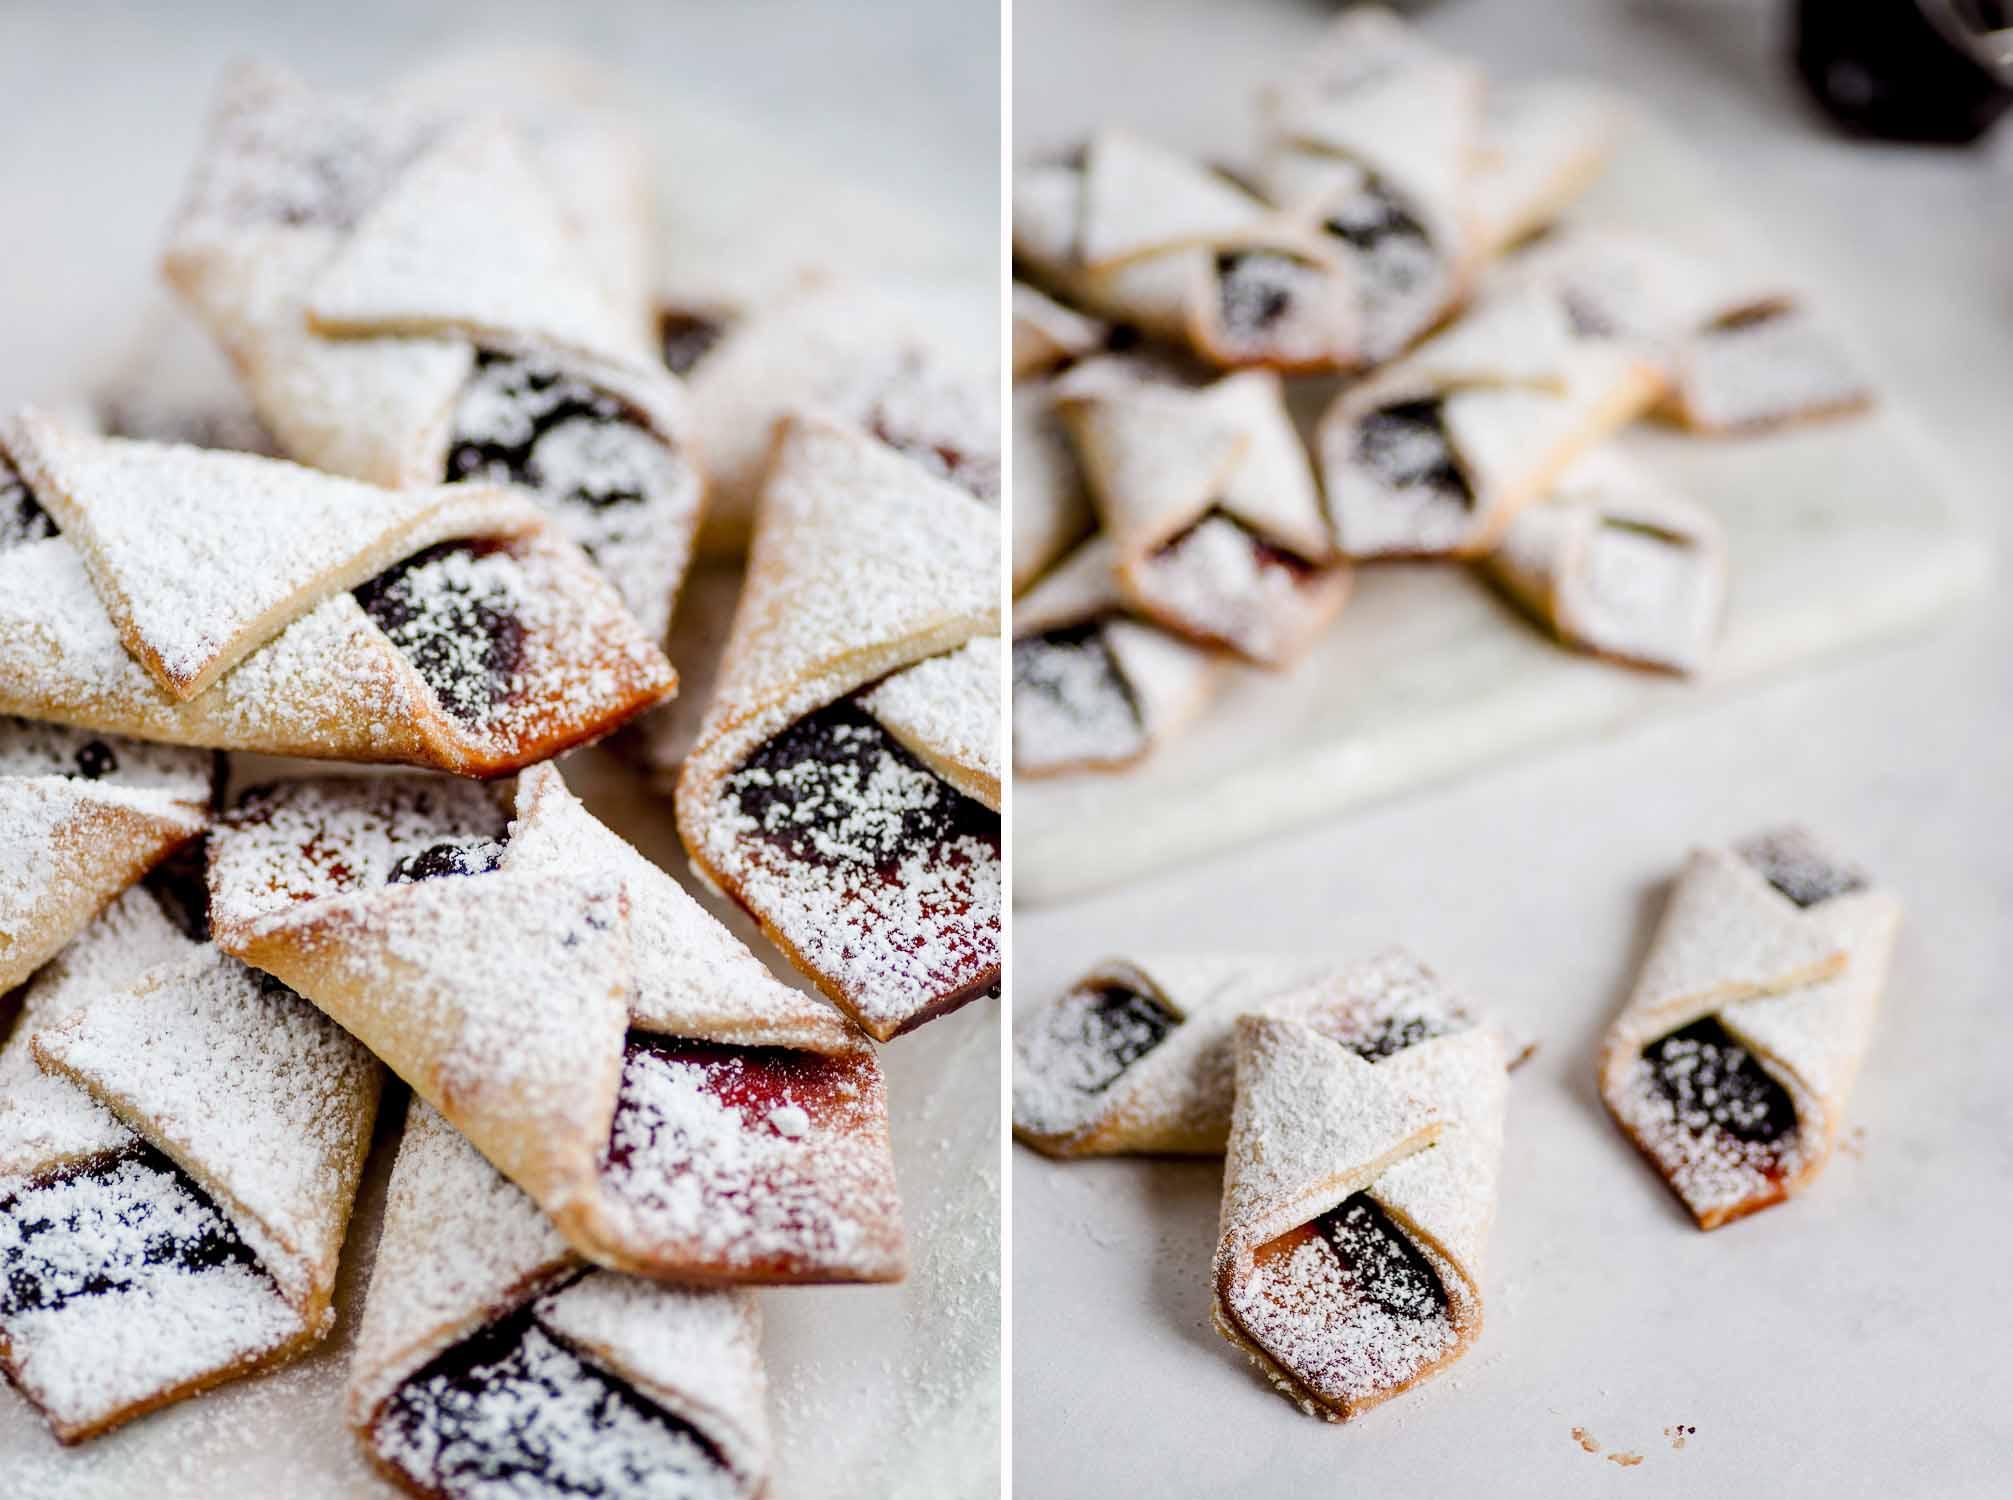 Polish Christmas Cookies.Kolaczki Biscuits Polish Christmas Cream Cheese Biscuits